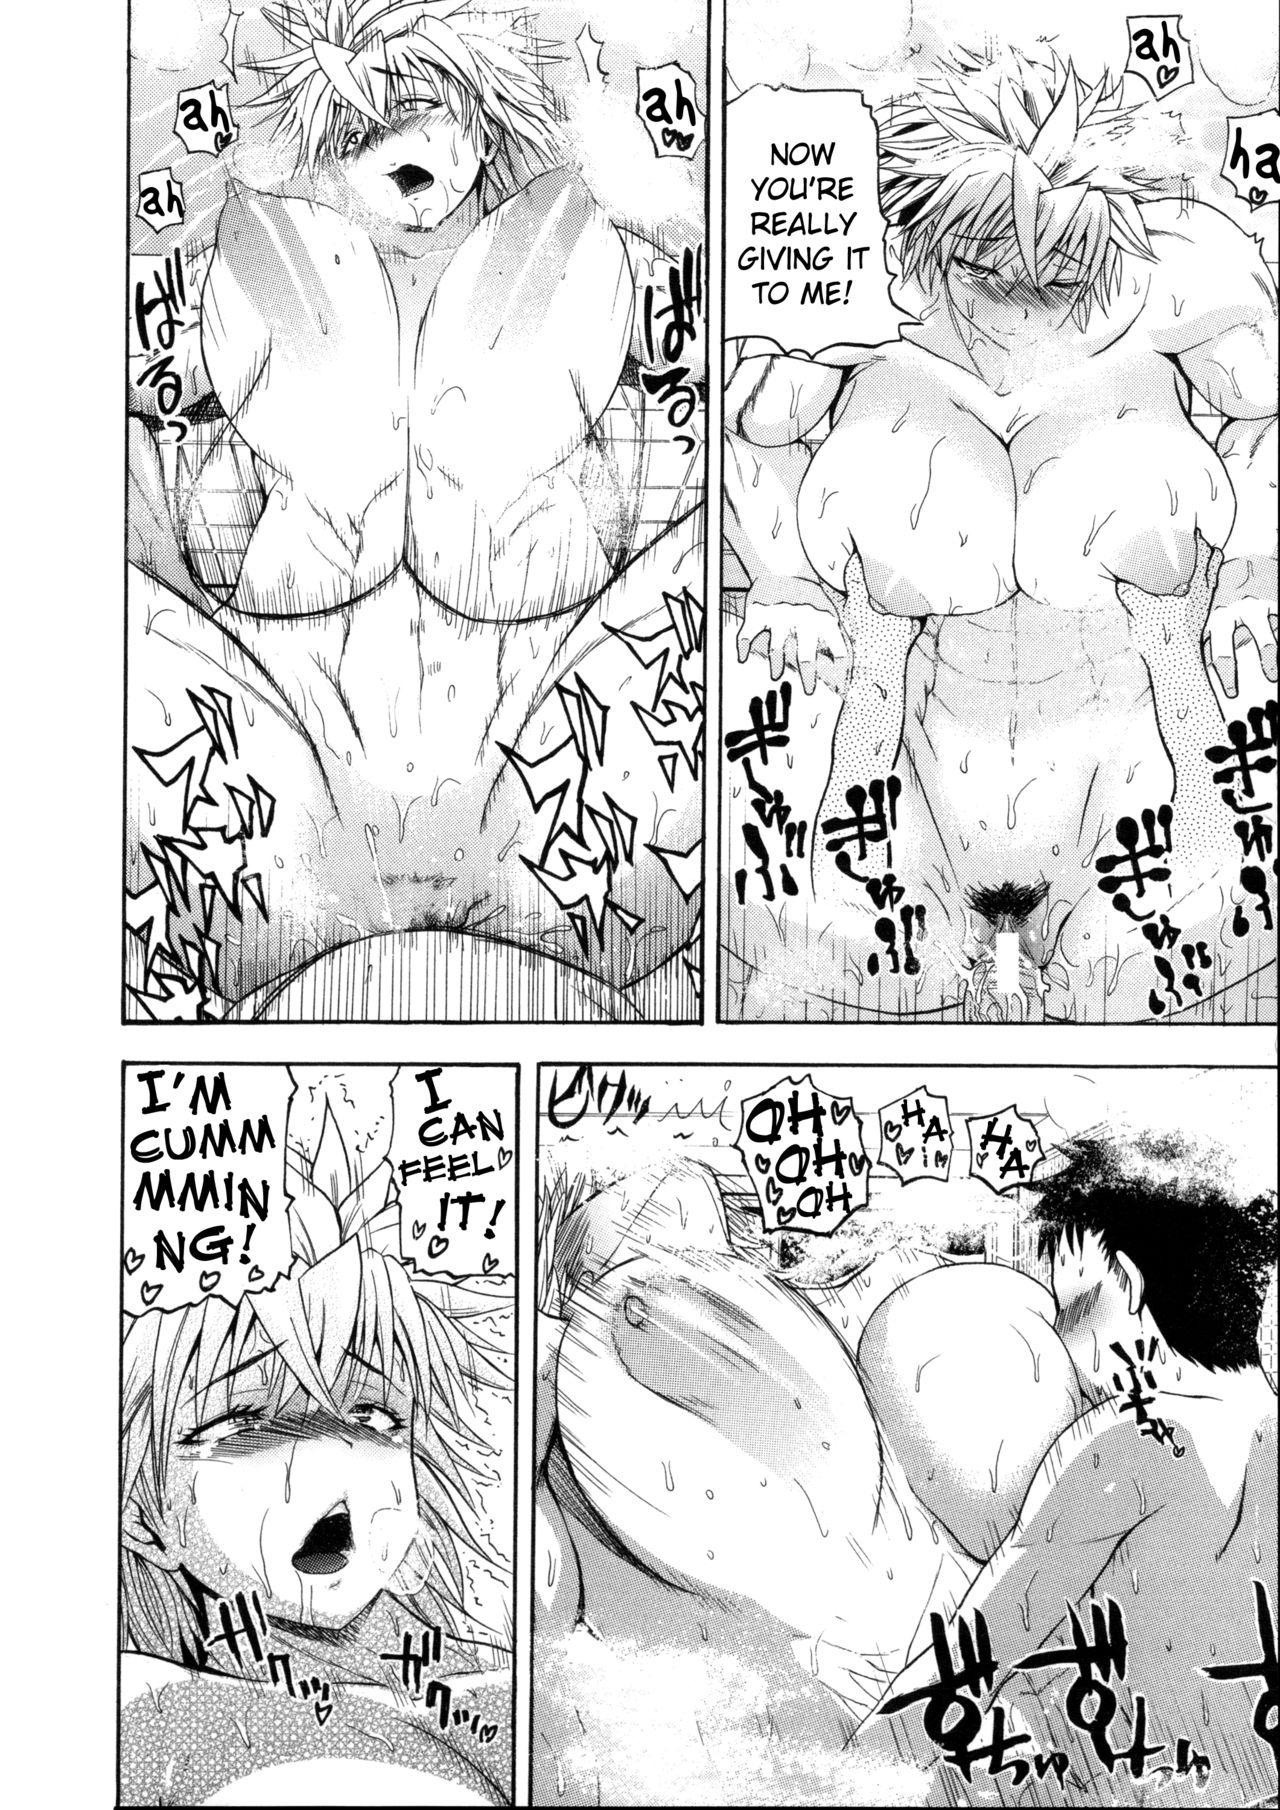 [Yoshimura Tatsumaki] Monzetsu Taigatame ~Count 3 de Ikasete Ageru~ | Faint in Agony Bodylock ~I'll make you cum on the count of 3~ [English] [Brolen] 146